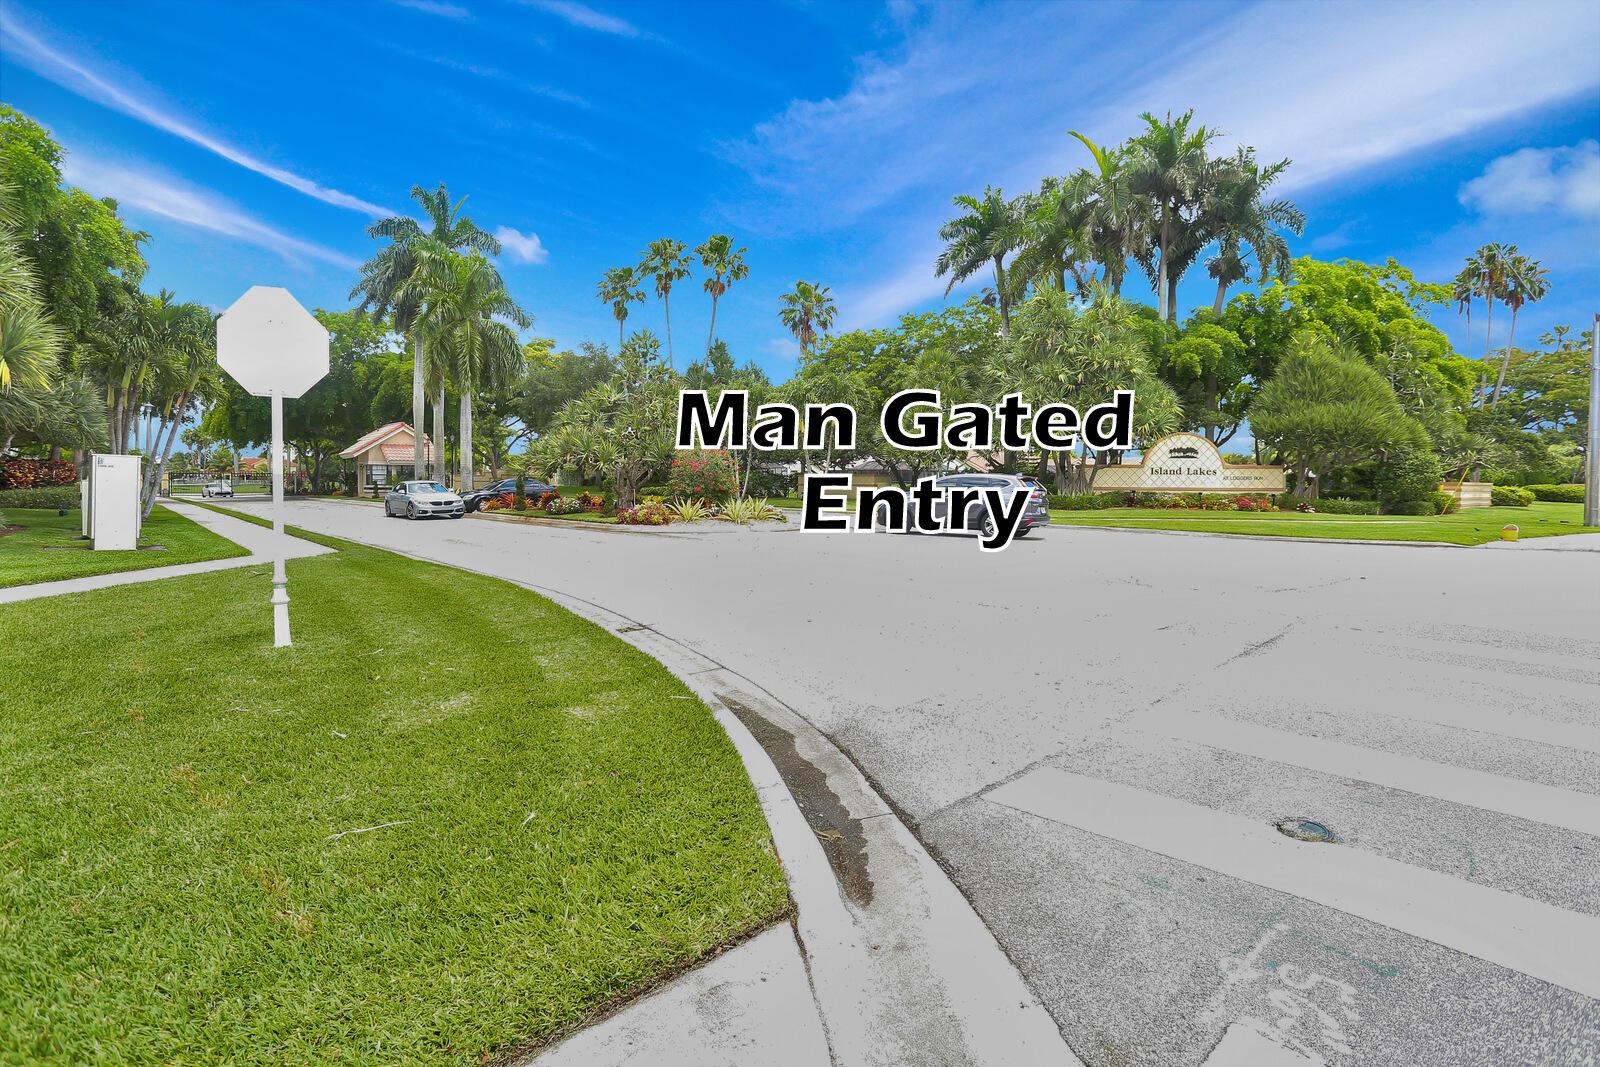 man gated entry